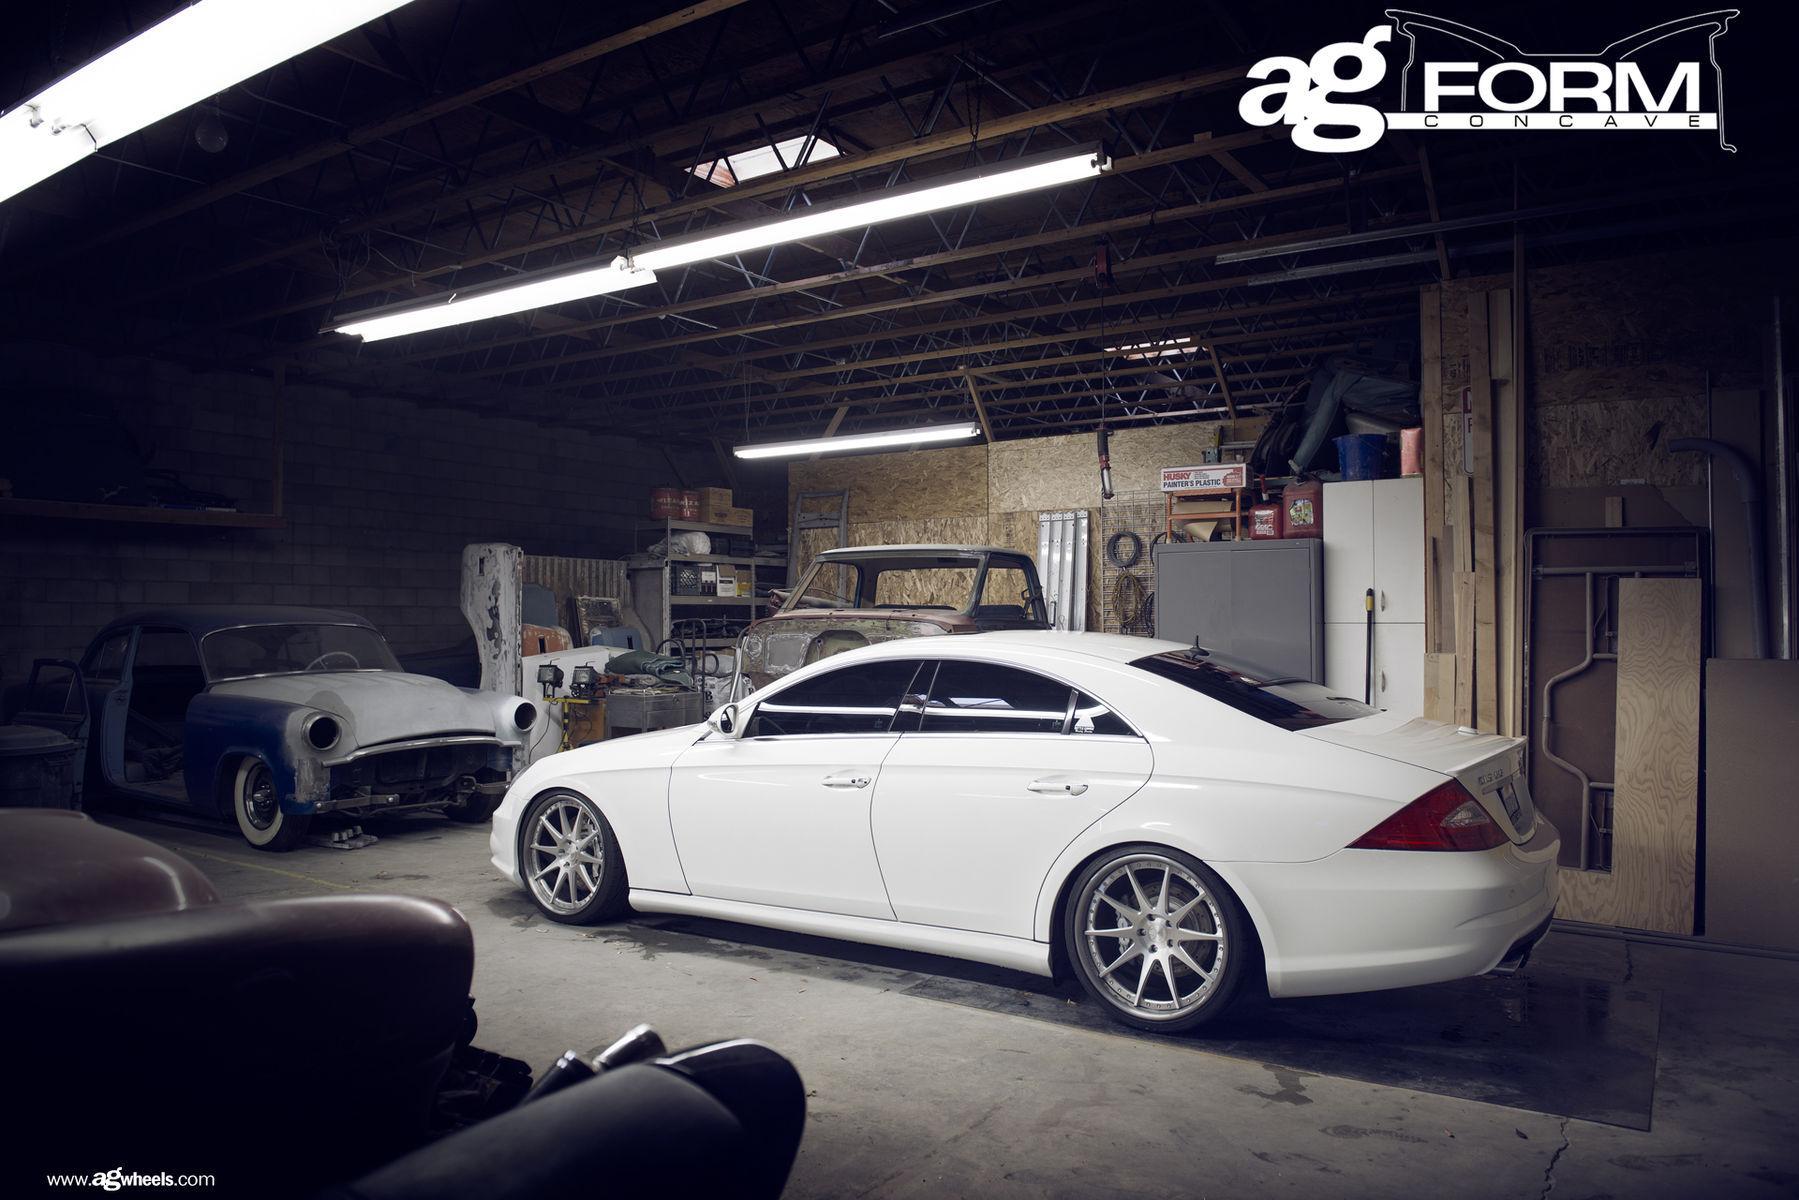 Mercedes-Benz CLS-Class | Mercedes-Benz CLS55 AMG